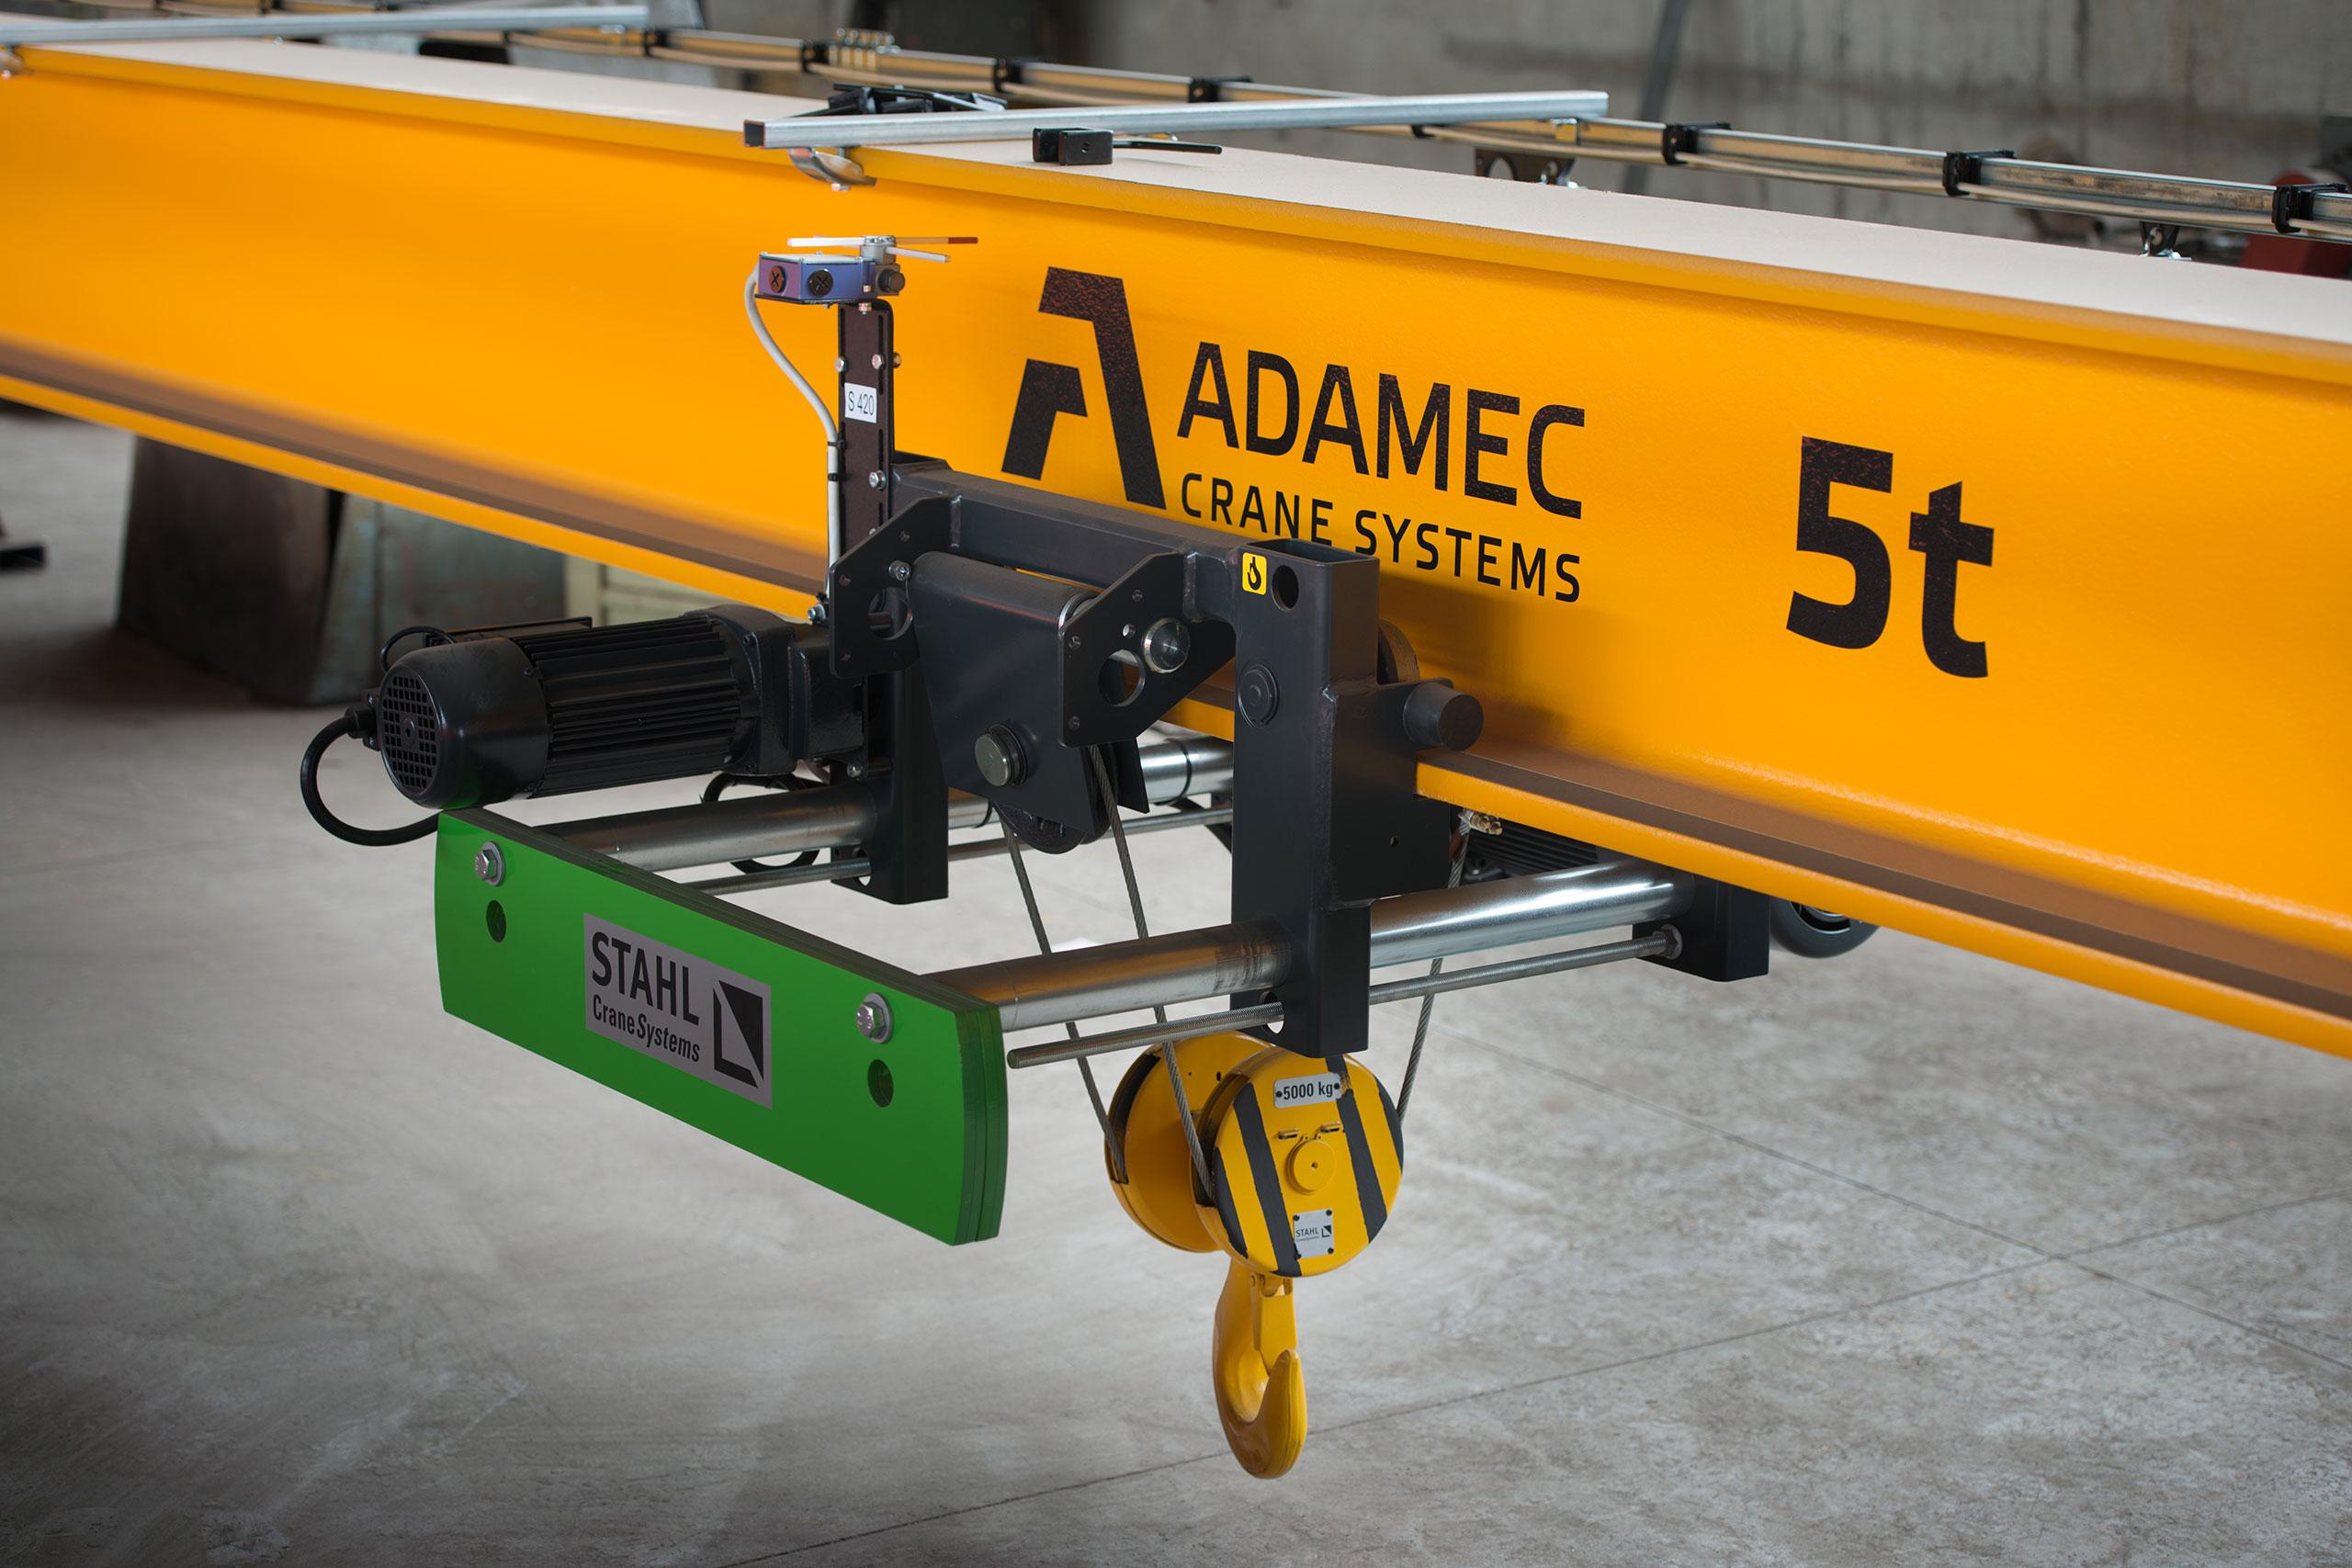 Crane Systems Adamec